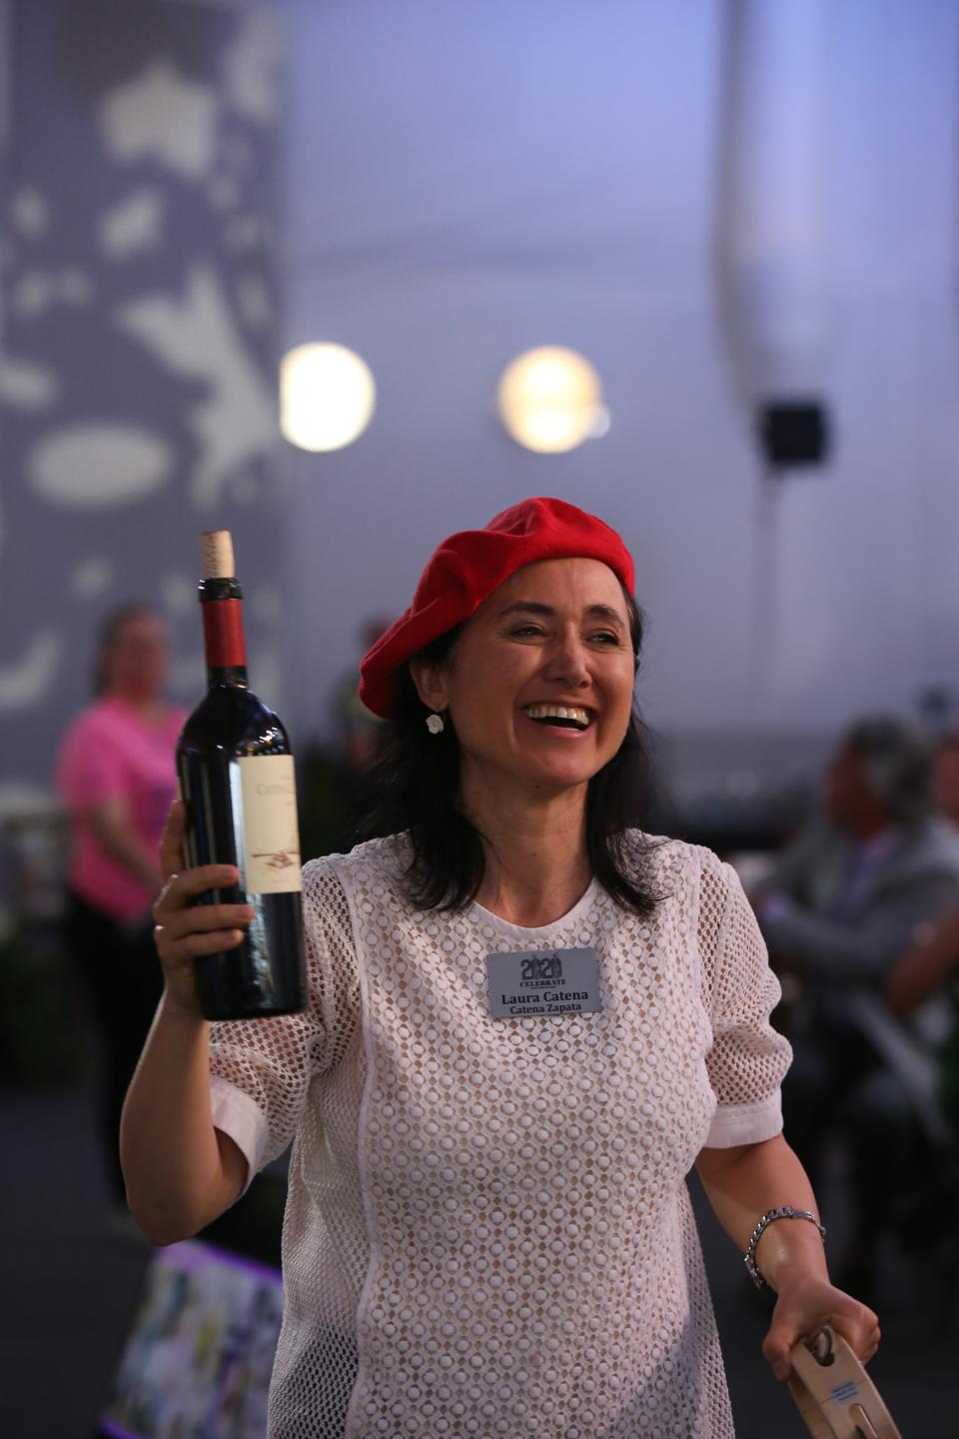 Argentinian winemaker Laura Catena